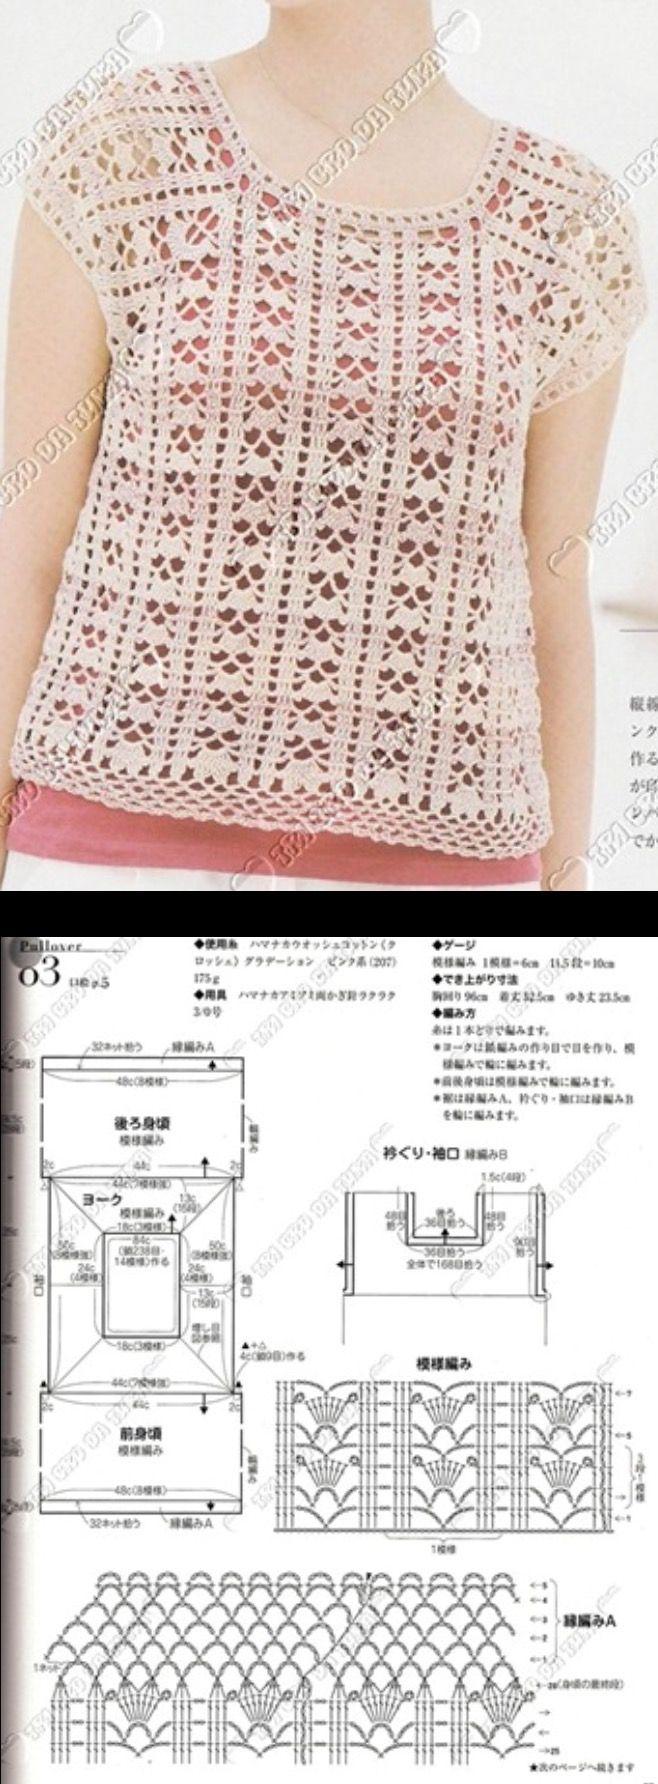 1757 best Gehekelde klere images on Pinterest | Crochet clothes ...